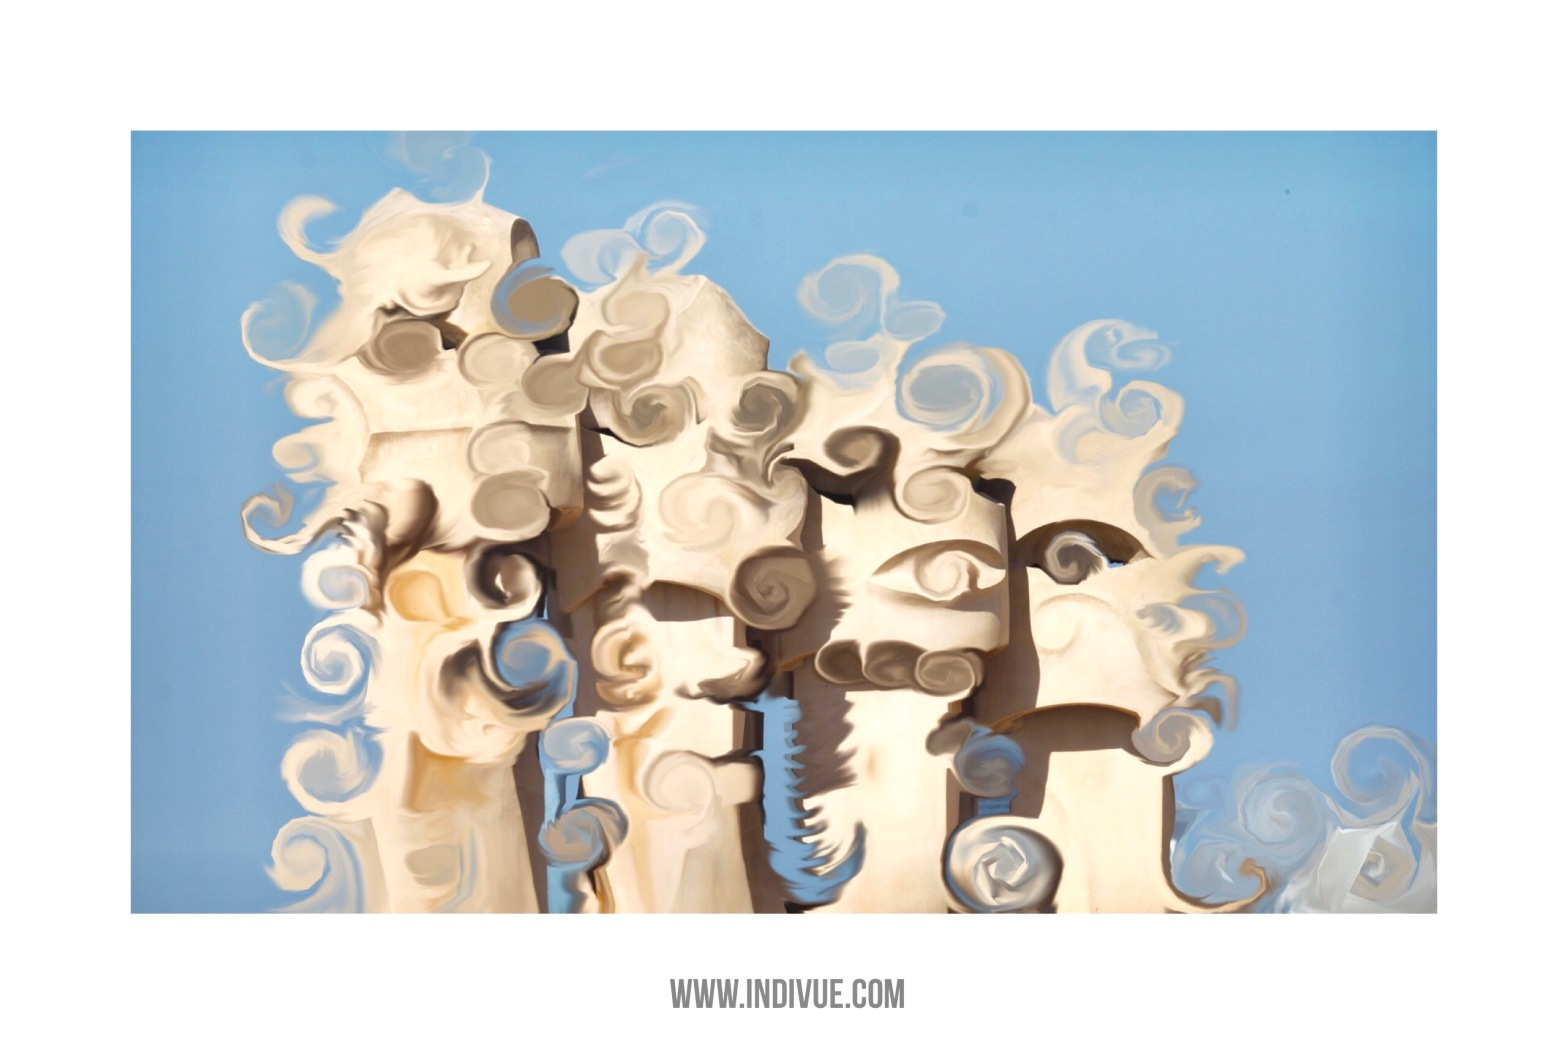 Indivue art inspired by Barcelona